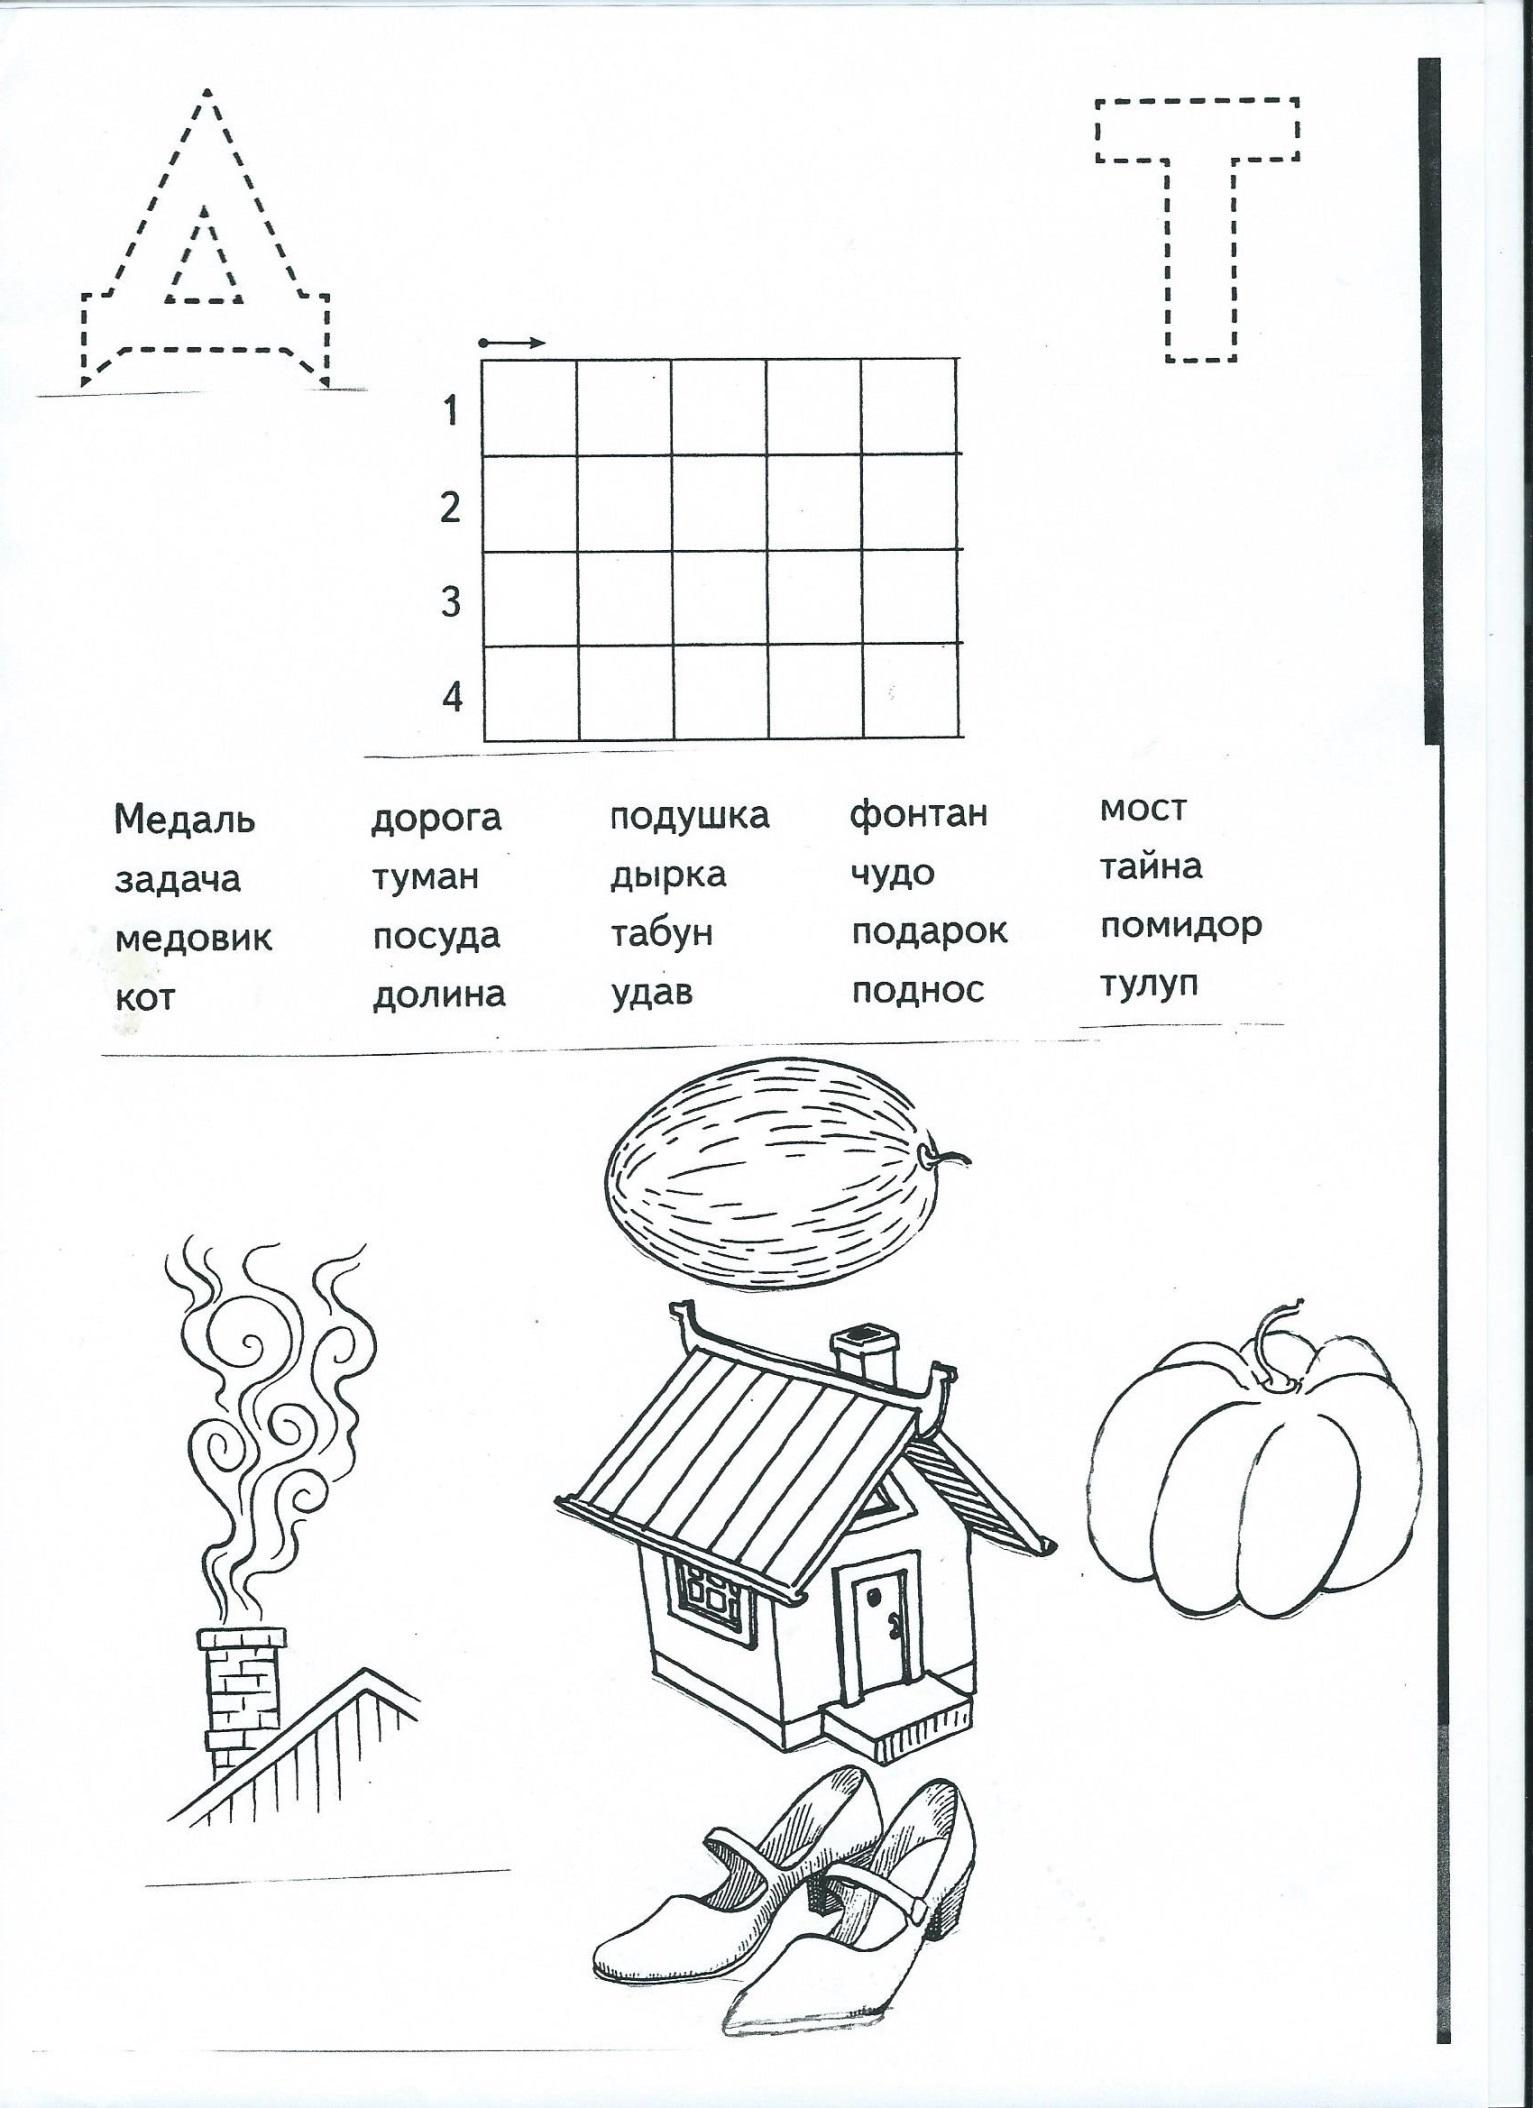 C:\Users\Sveta\Documents\Scan0001.jpg